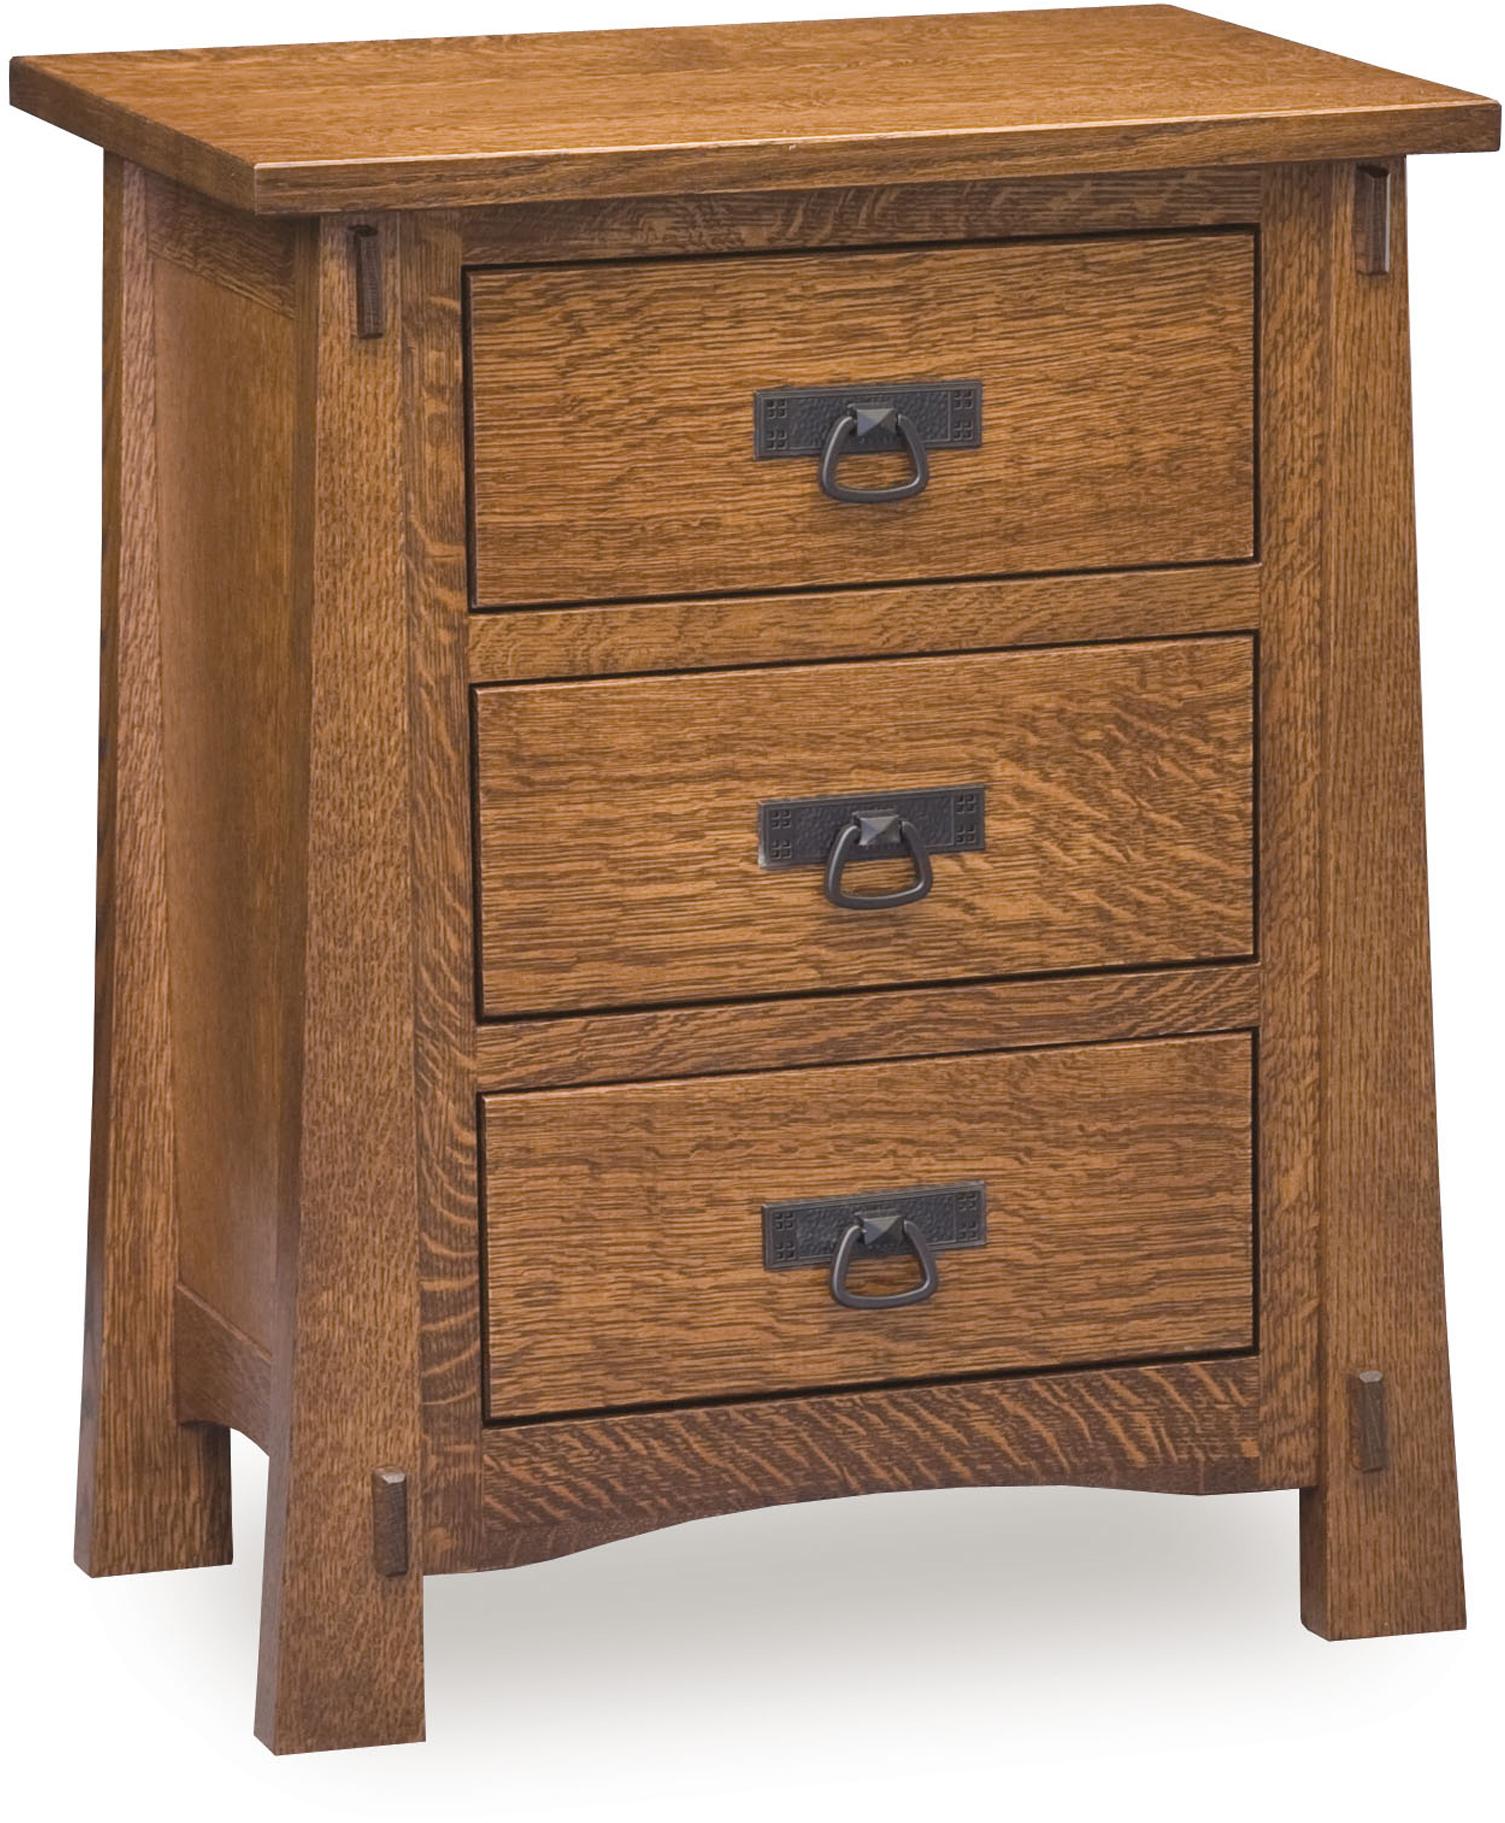 Bedroom Furniture Sales Online: Custom Amish Modesto Bedroom